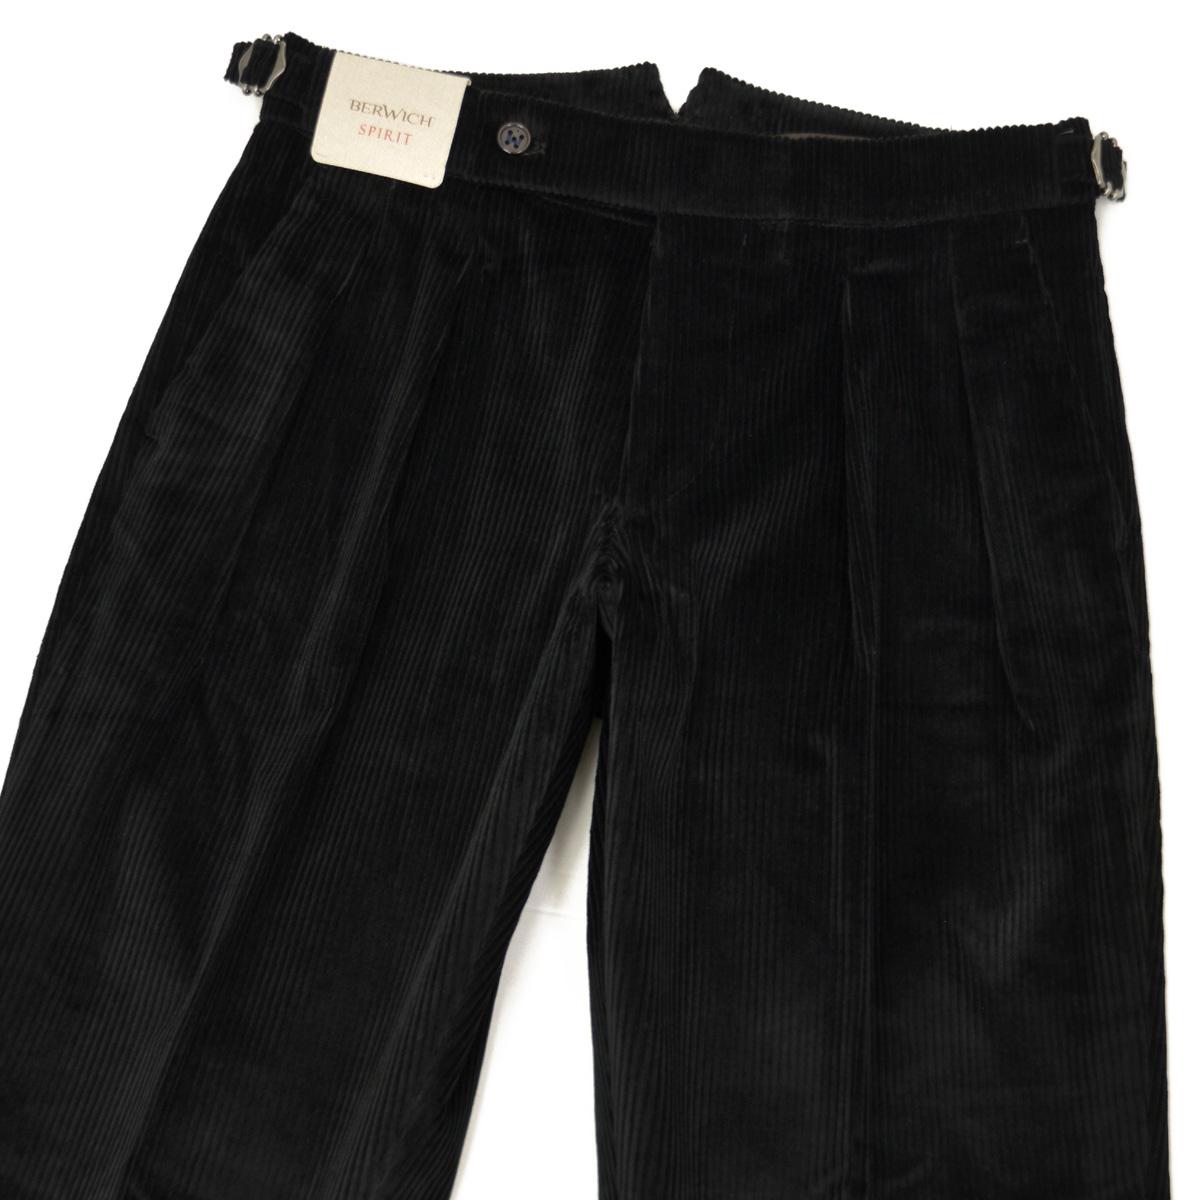 BERWICH【ベルウィッチ】ツープリーツパンツ SCOTCH DV1350X BLACK コーデュロイ ブラック